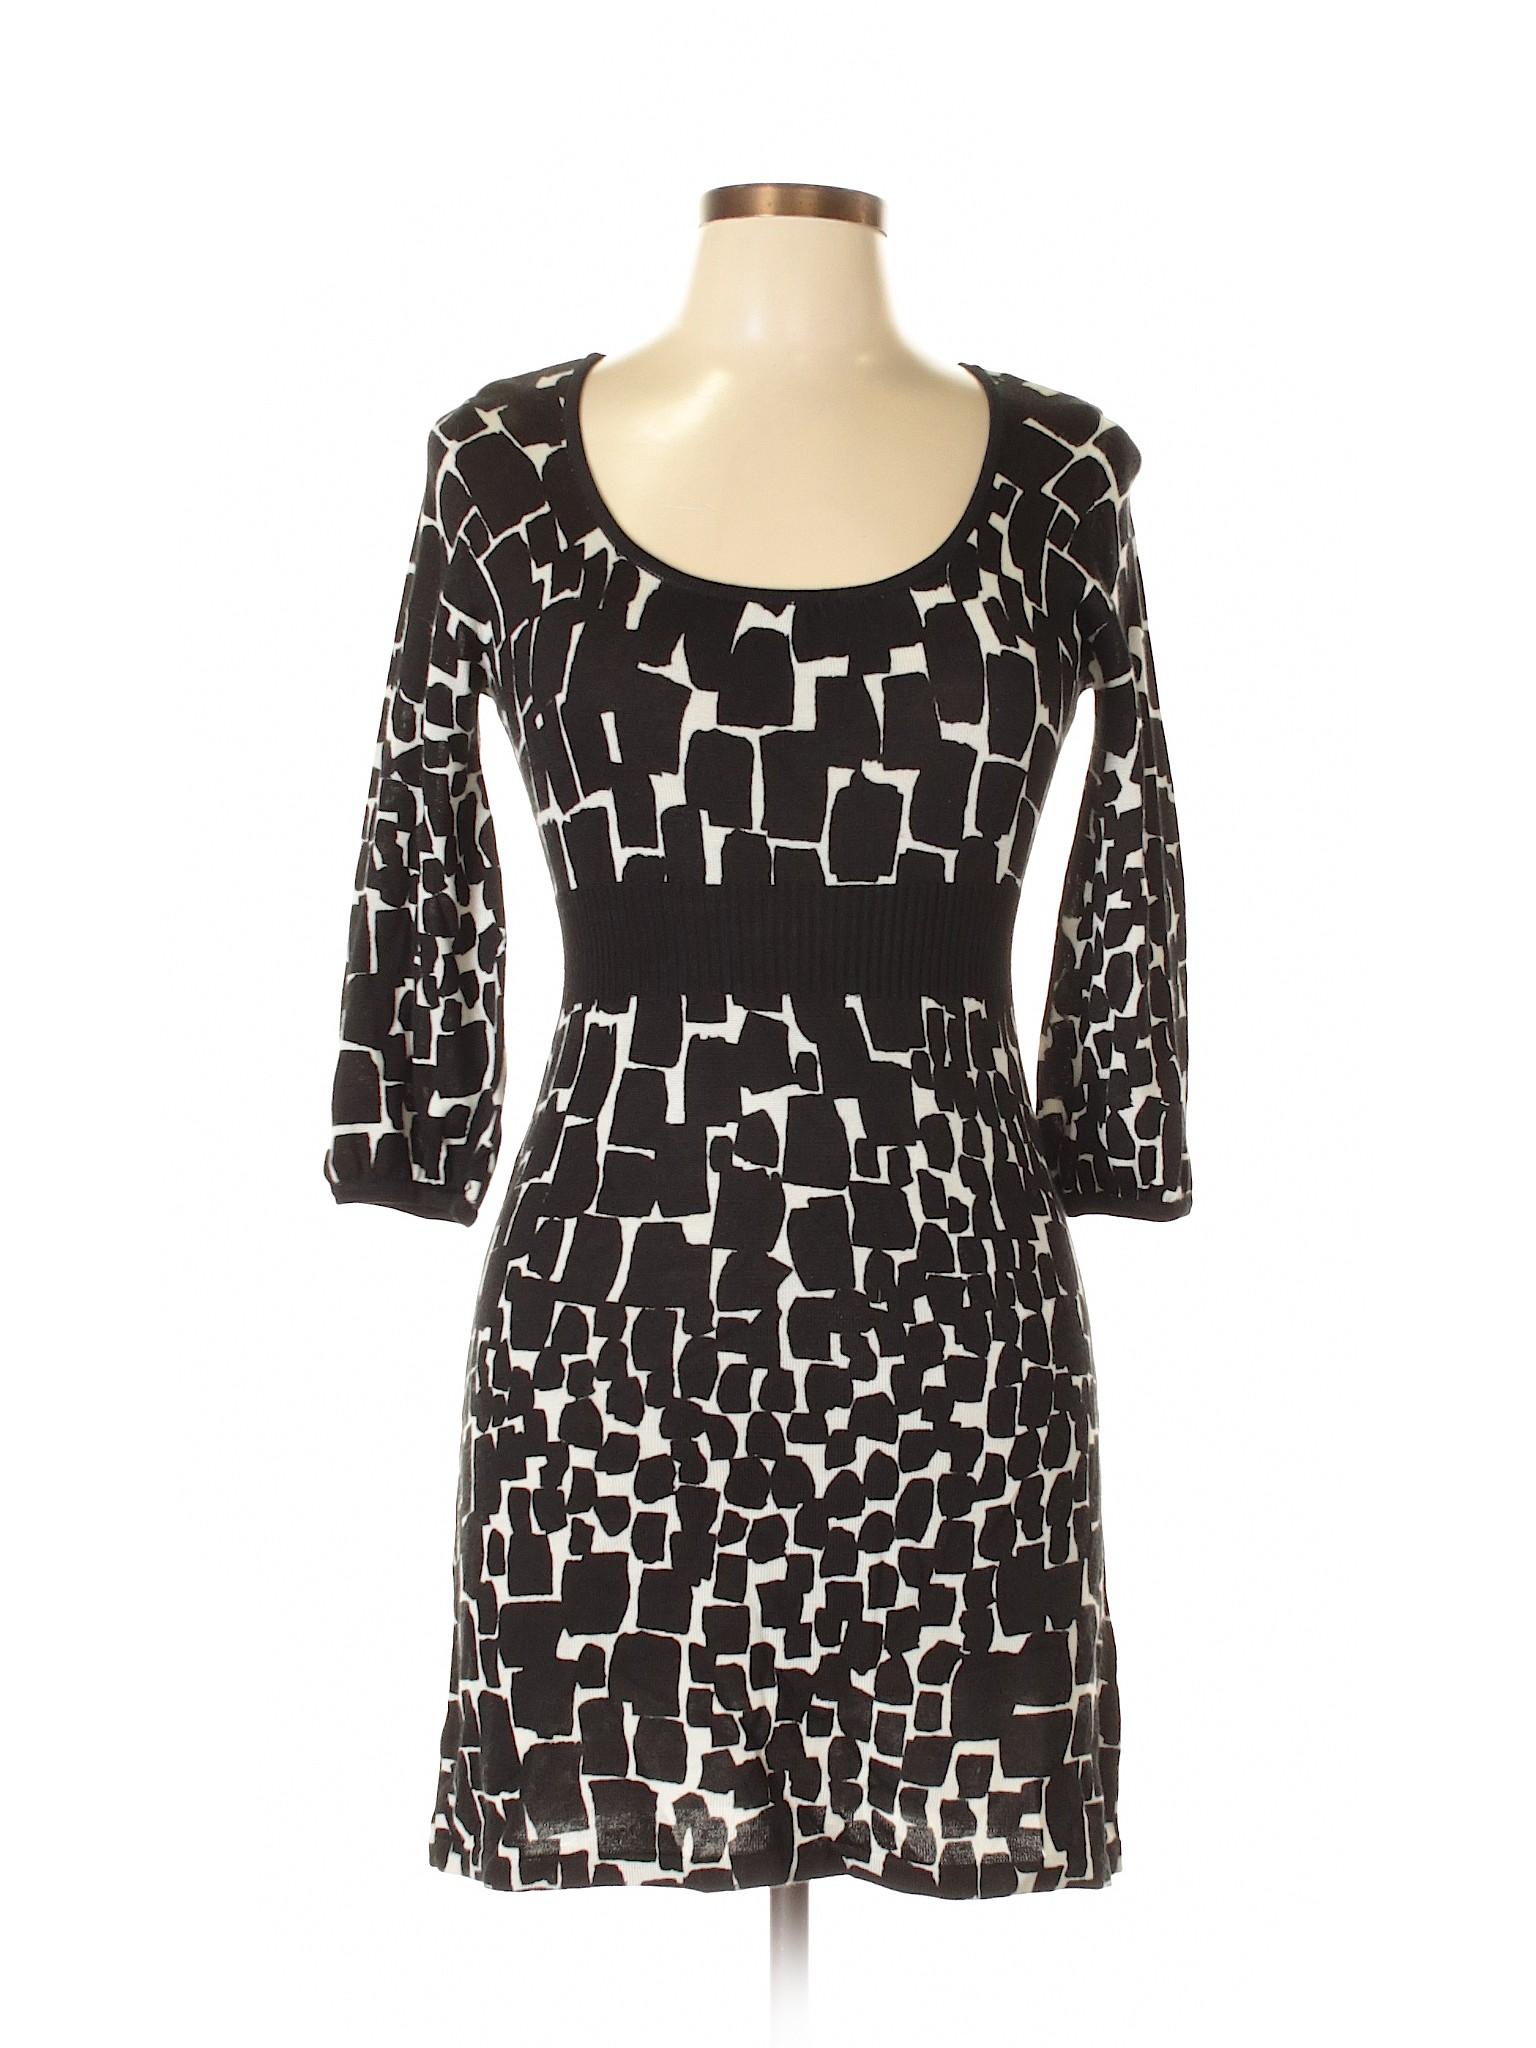 Market Casual Dress House White Boutique Black winter IwnqFnSO